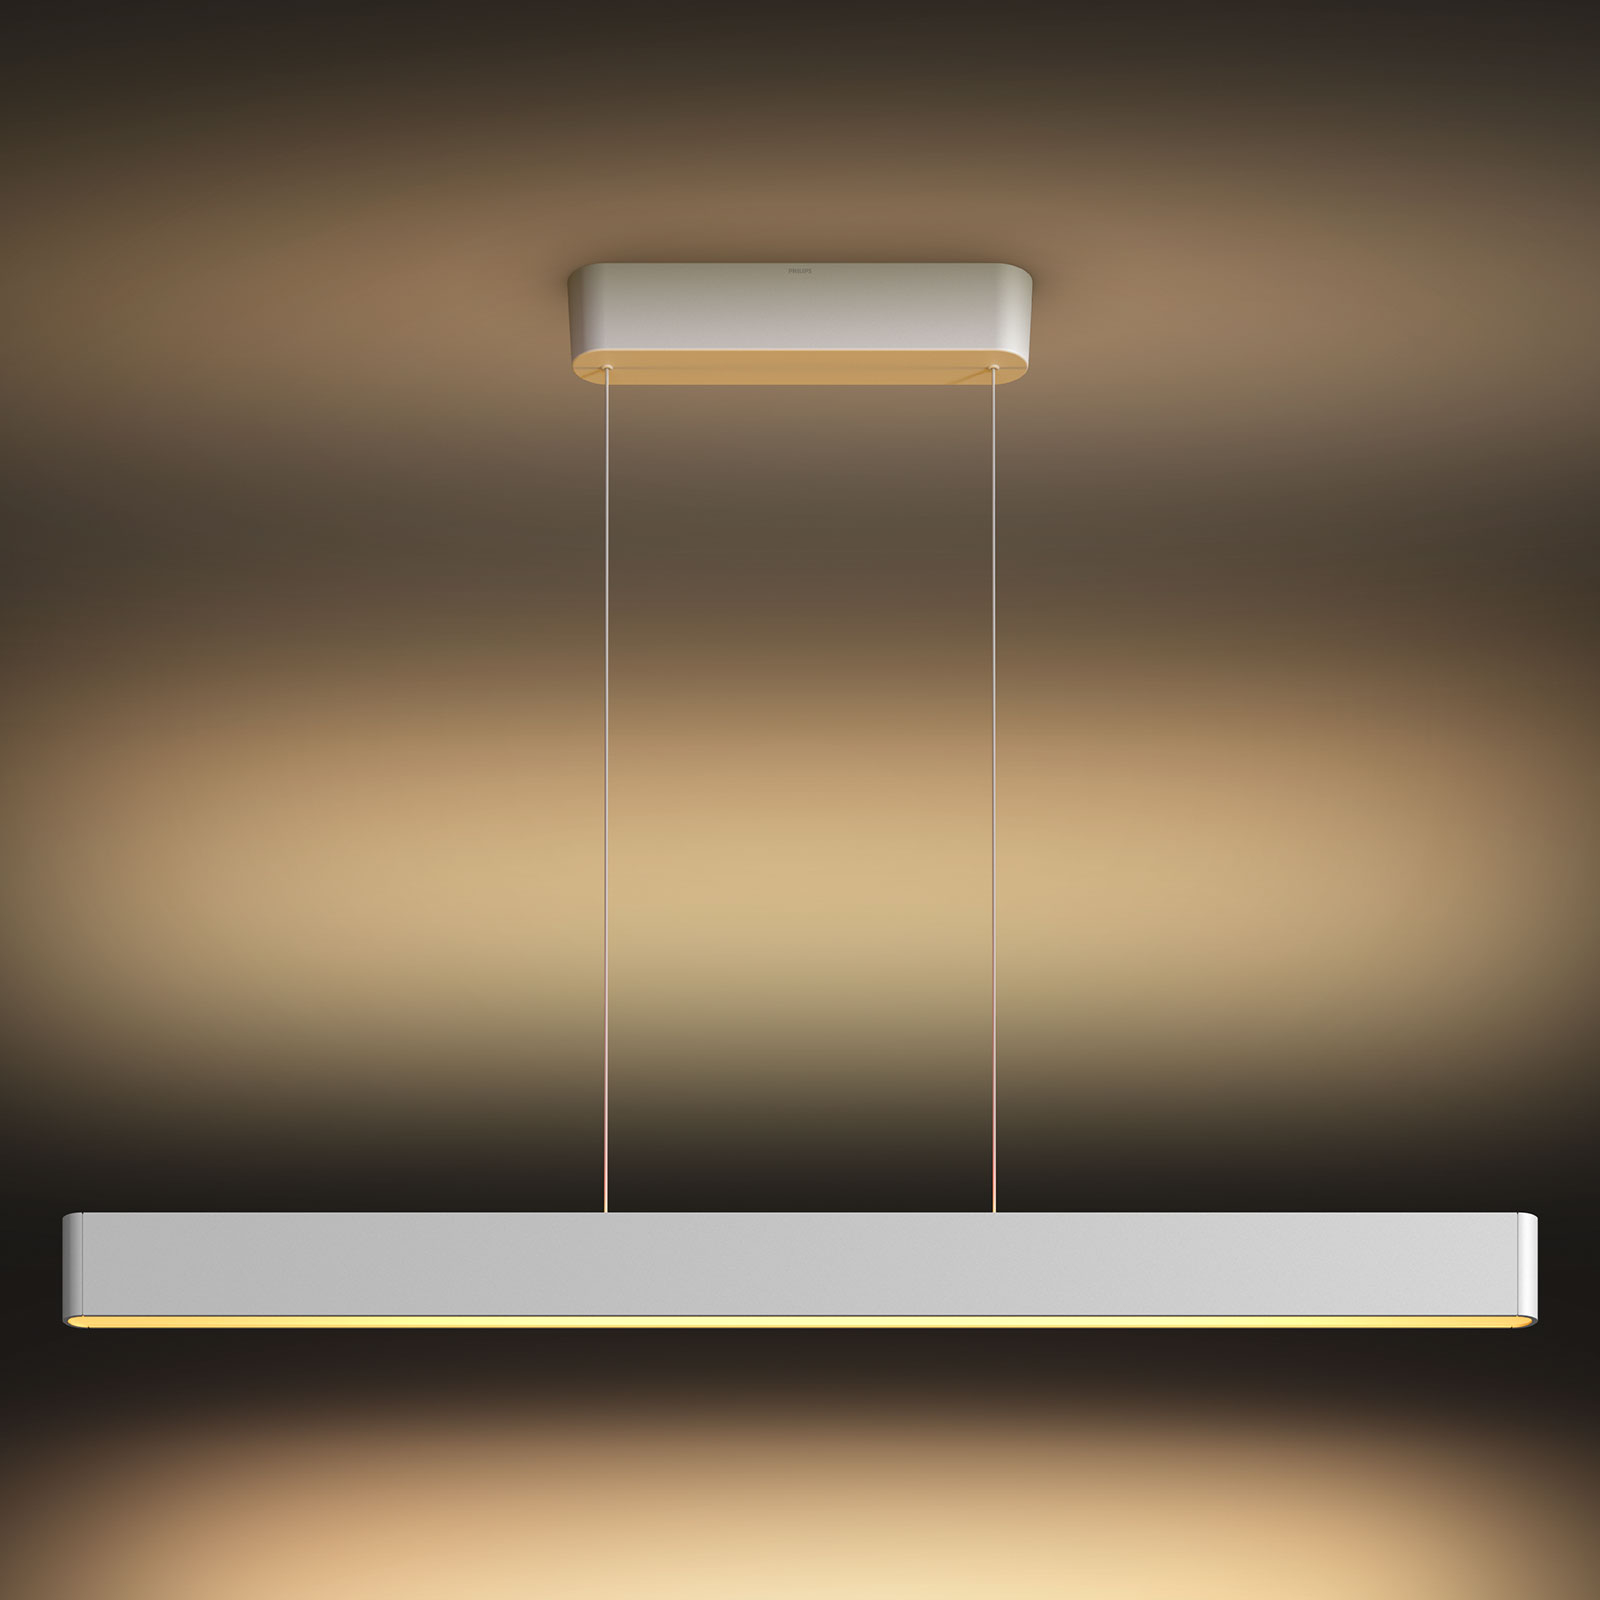 Philips Hue Ensis LED-Hängeleuchte, RGBW